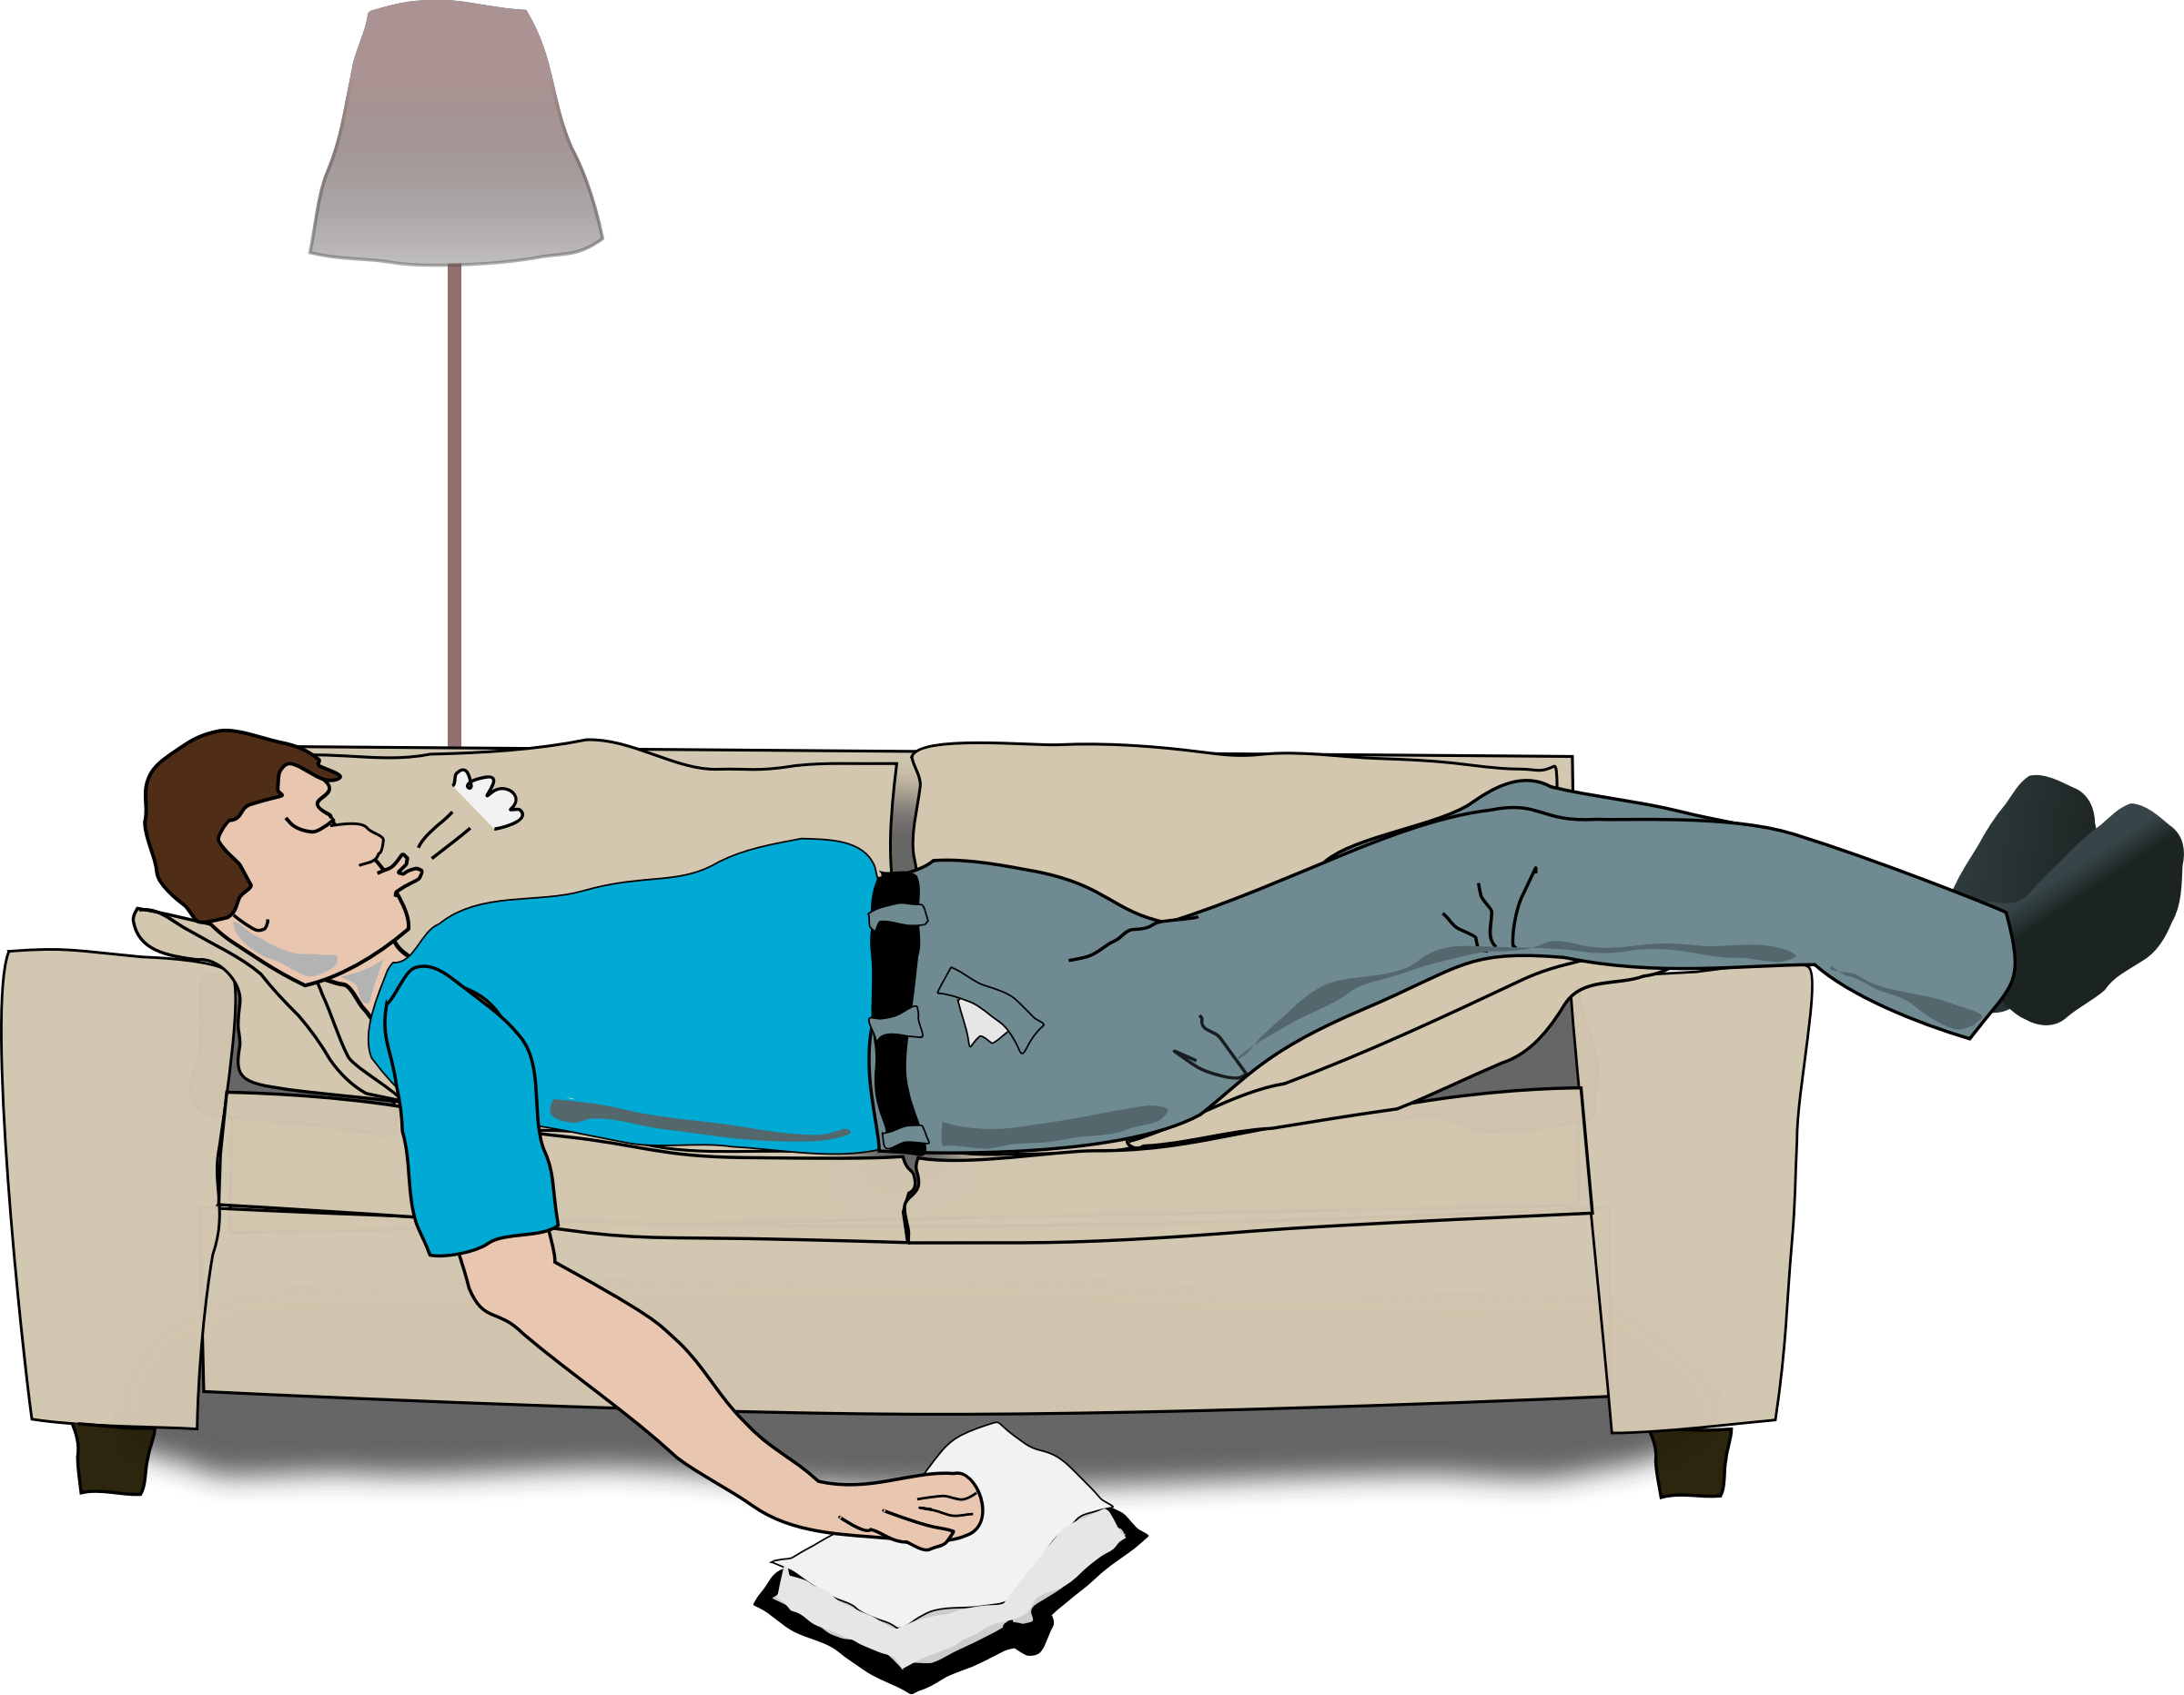 Sleeping by addon a. Exercise clipart sleep